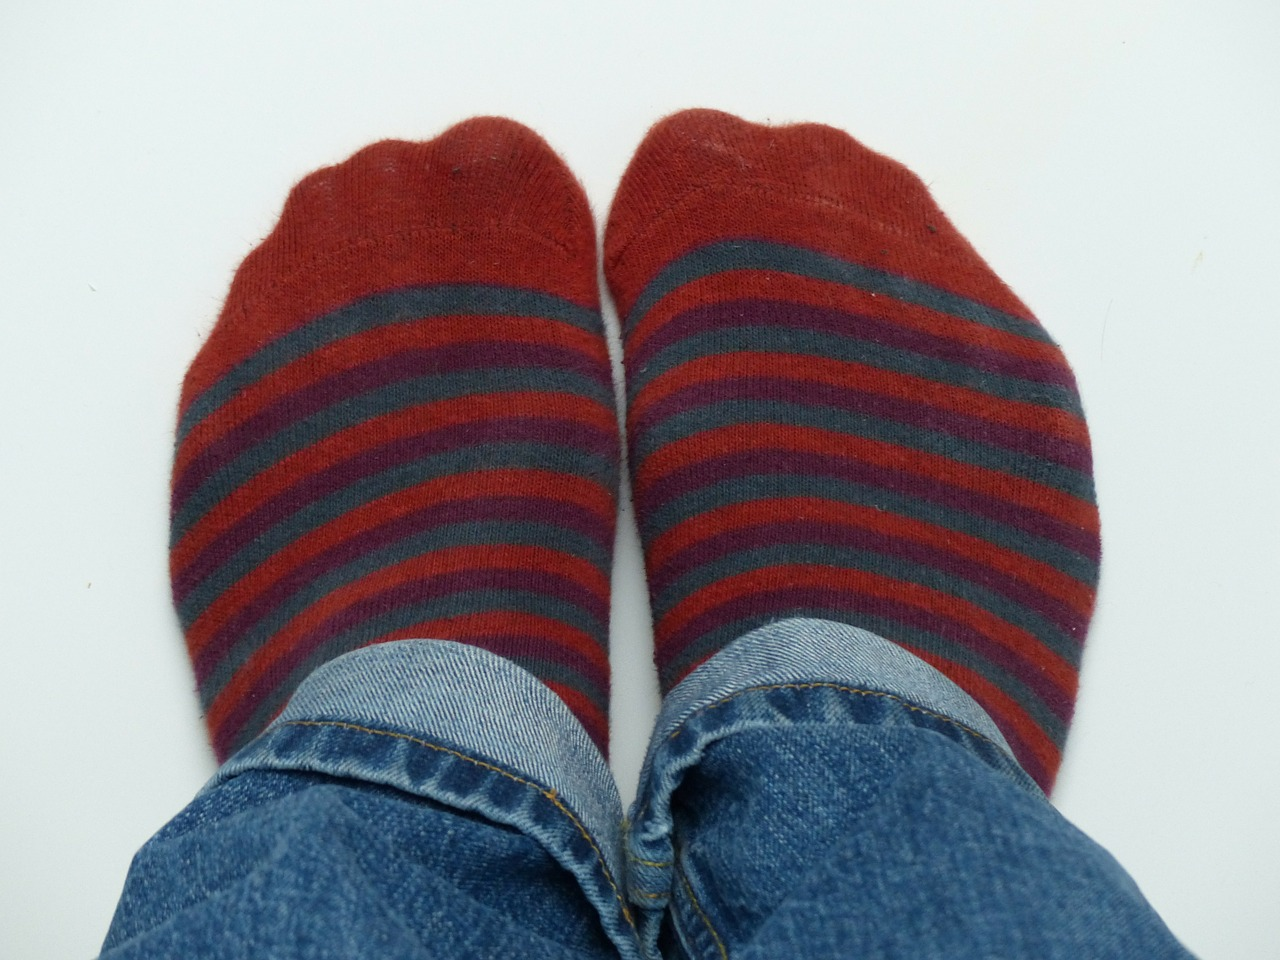 socks-91856_1280